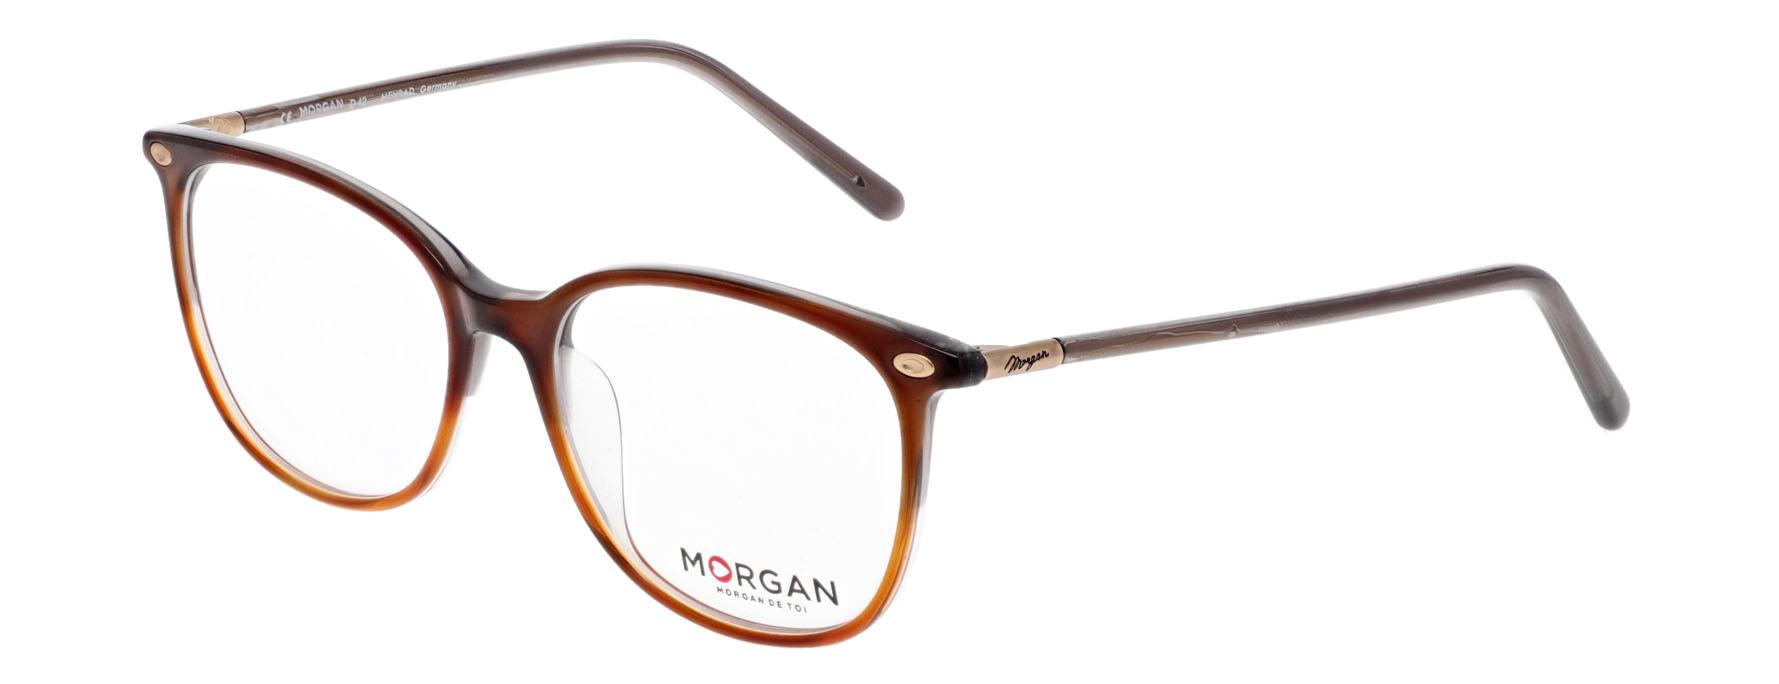 Morgan 202024 4799